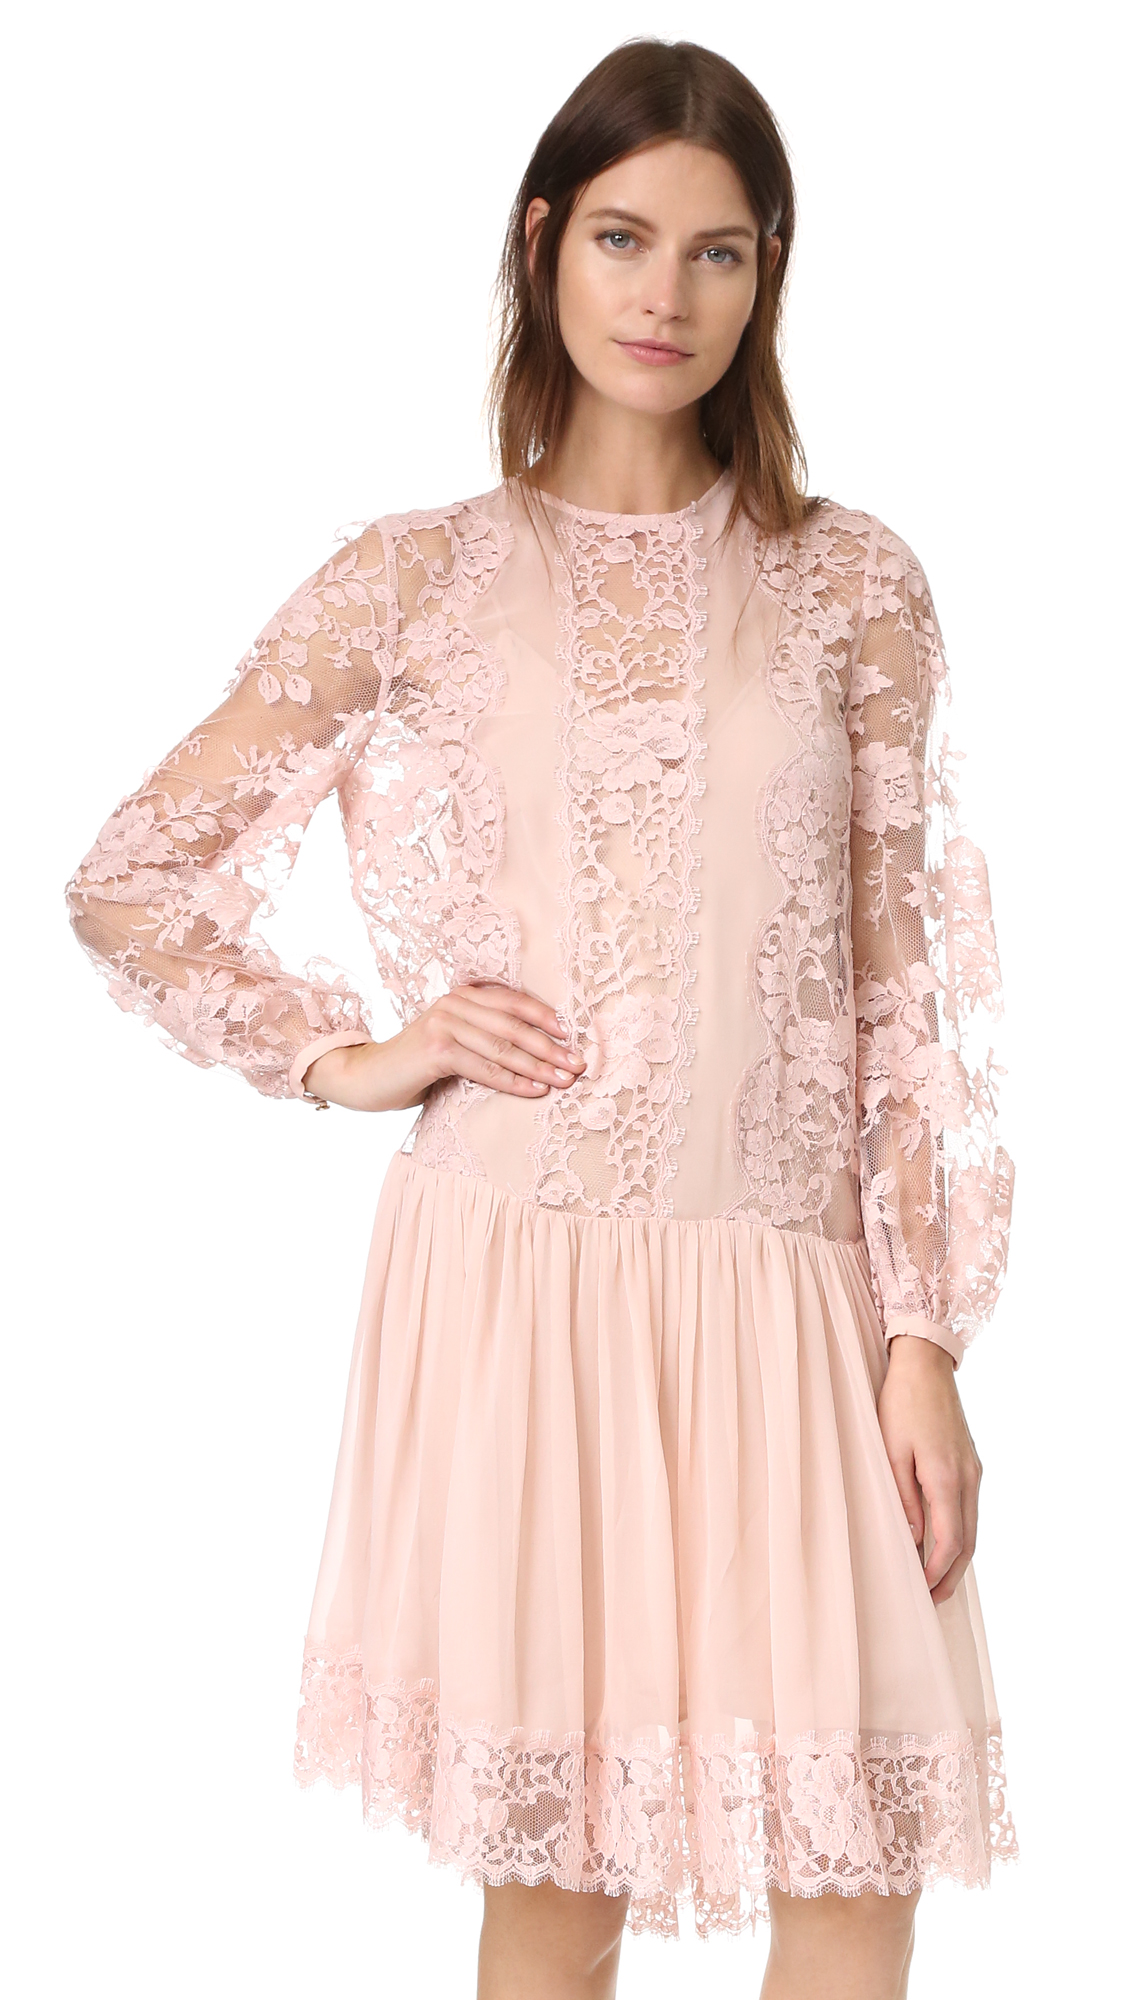 zimmermann female  zimmermann karmic lace dress lily